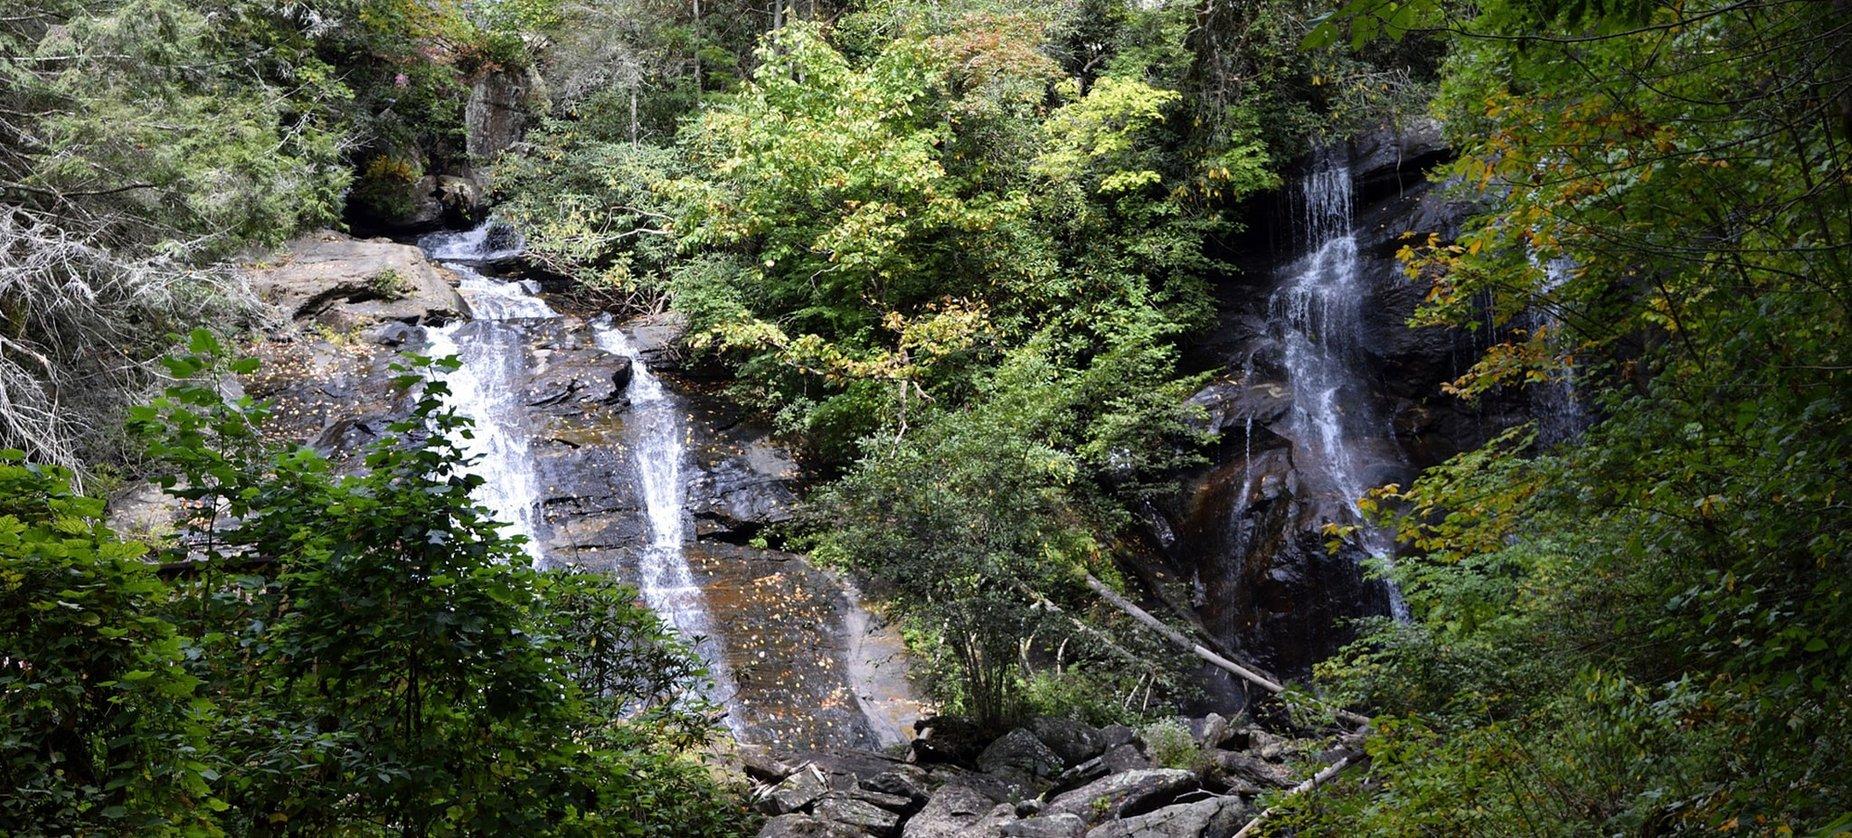 Cedar-Creek-Cabin-Rentals-Helen-Georgia-home-Ana-Ruby-falls-Spring-banner-1